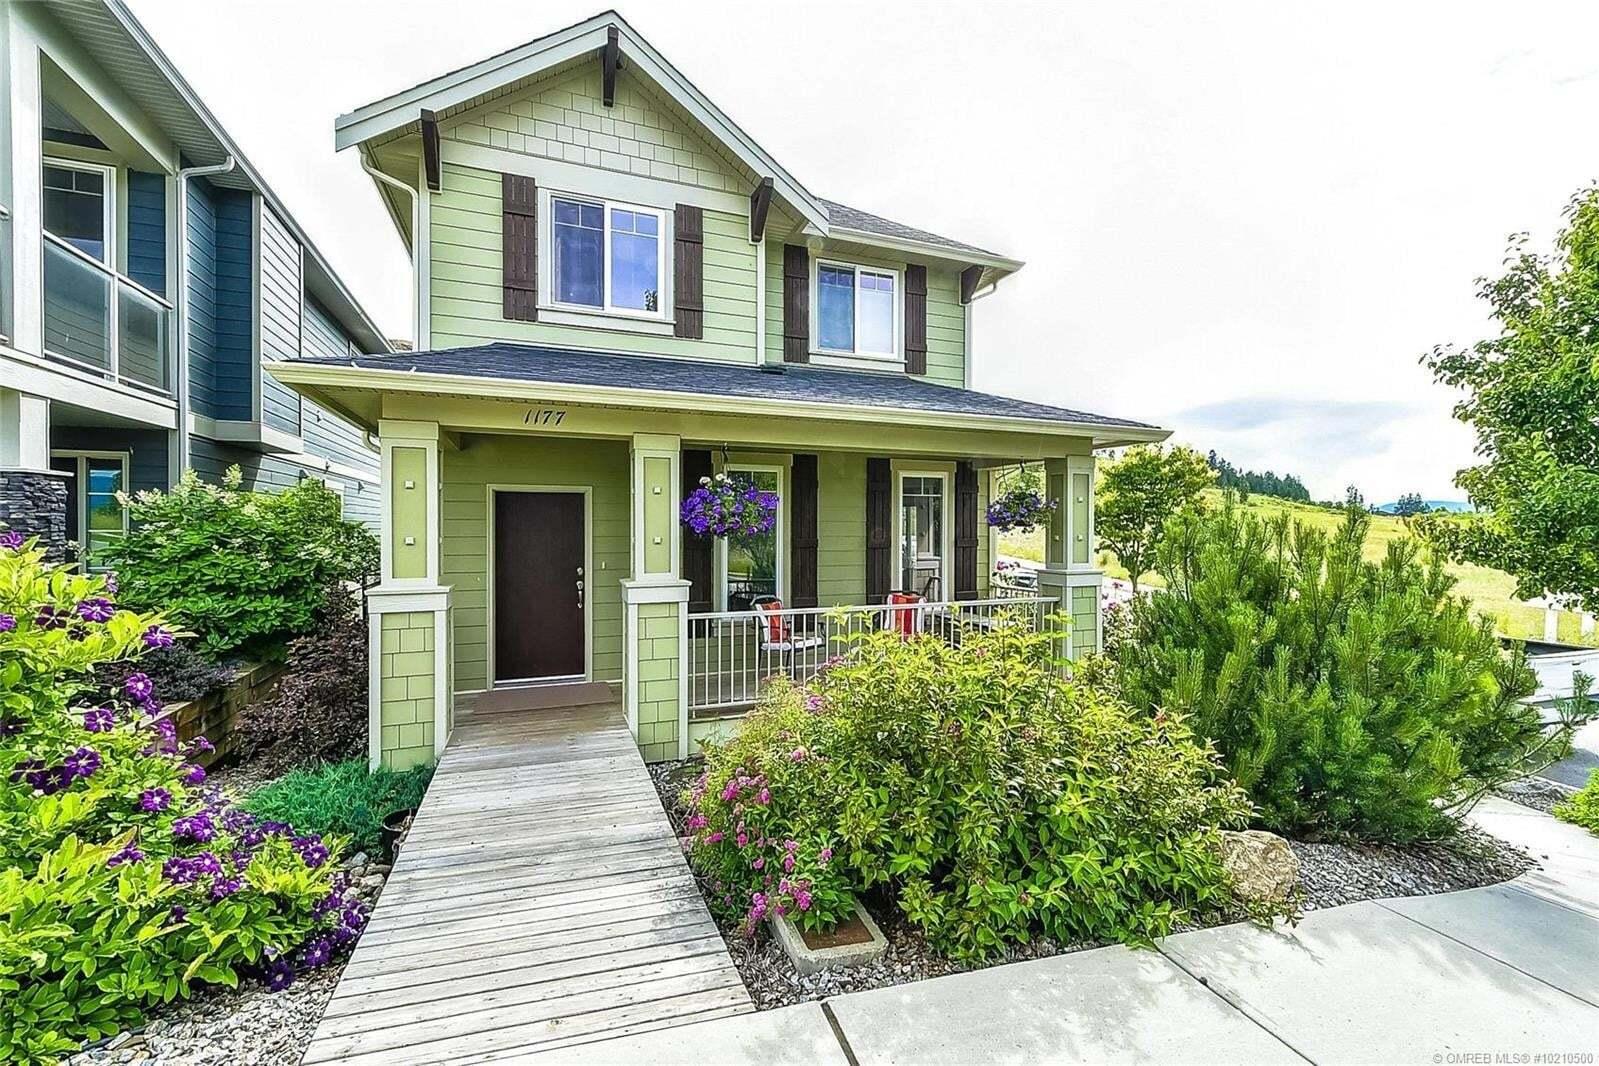 House for sale at 1177 Steele Rd Kelowna British Columbia - MLS: 10210500